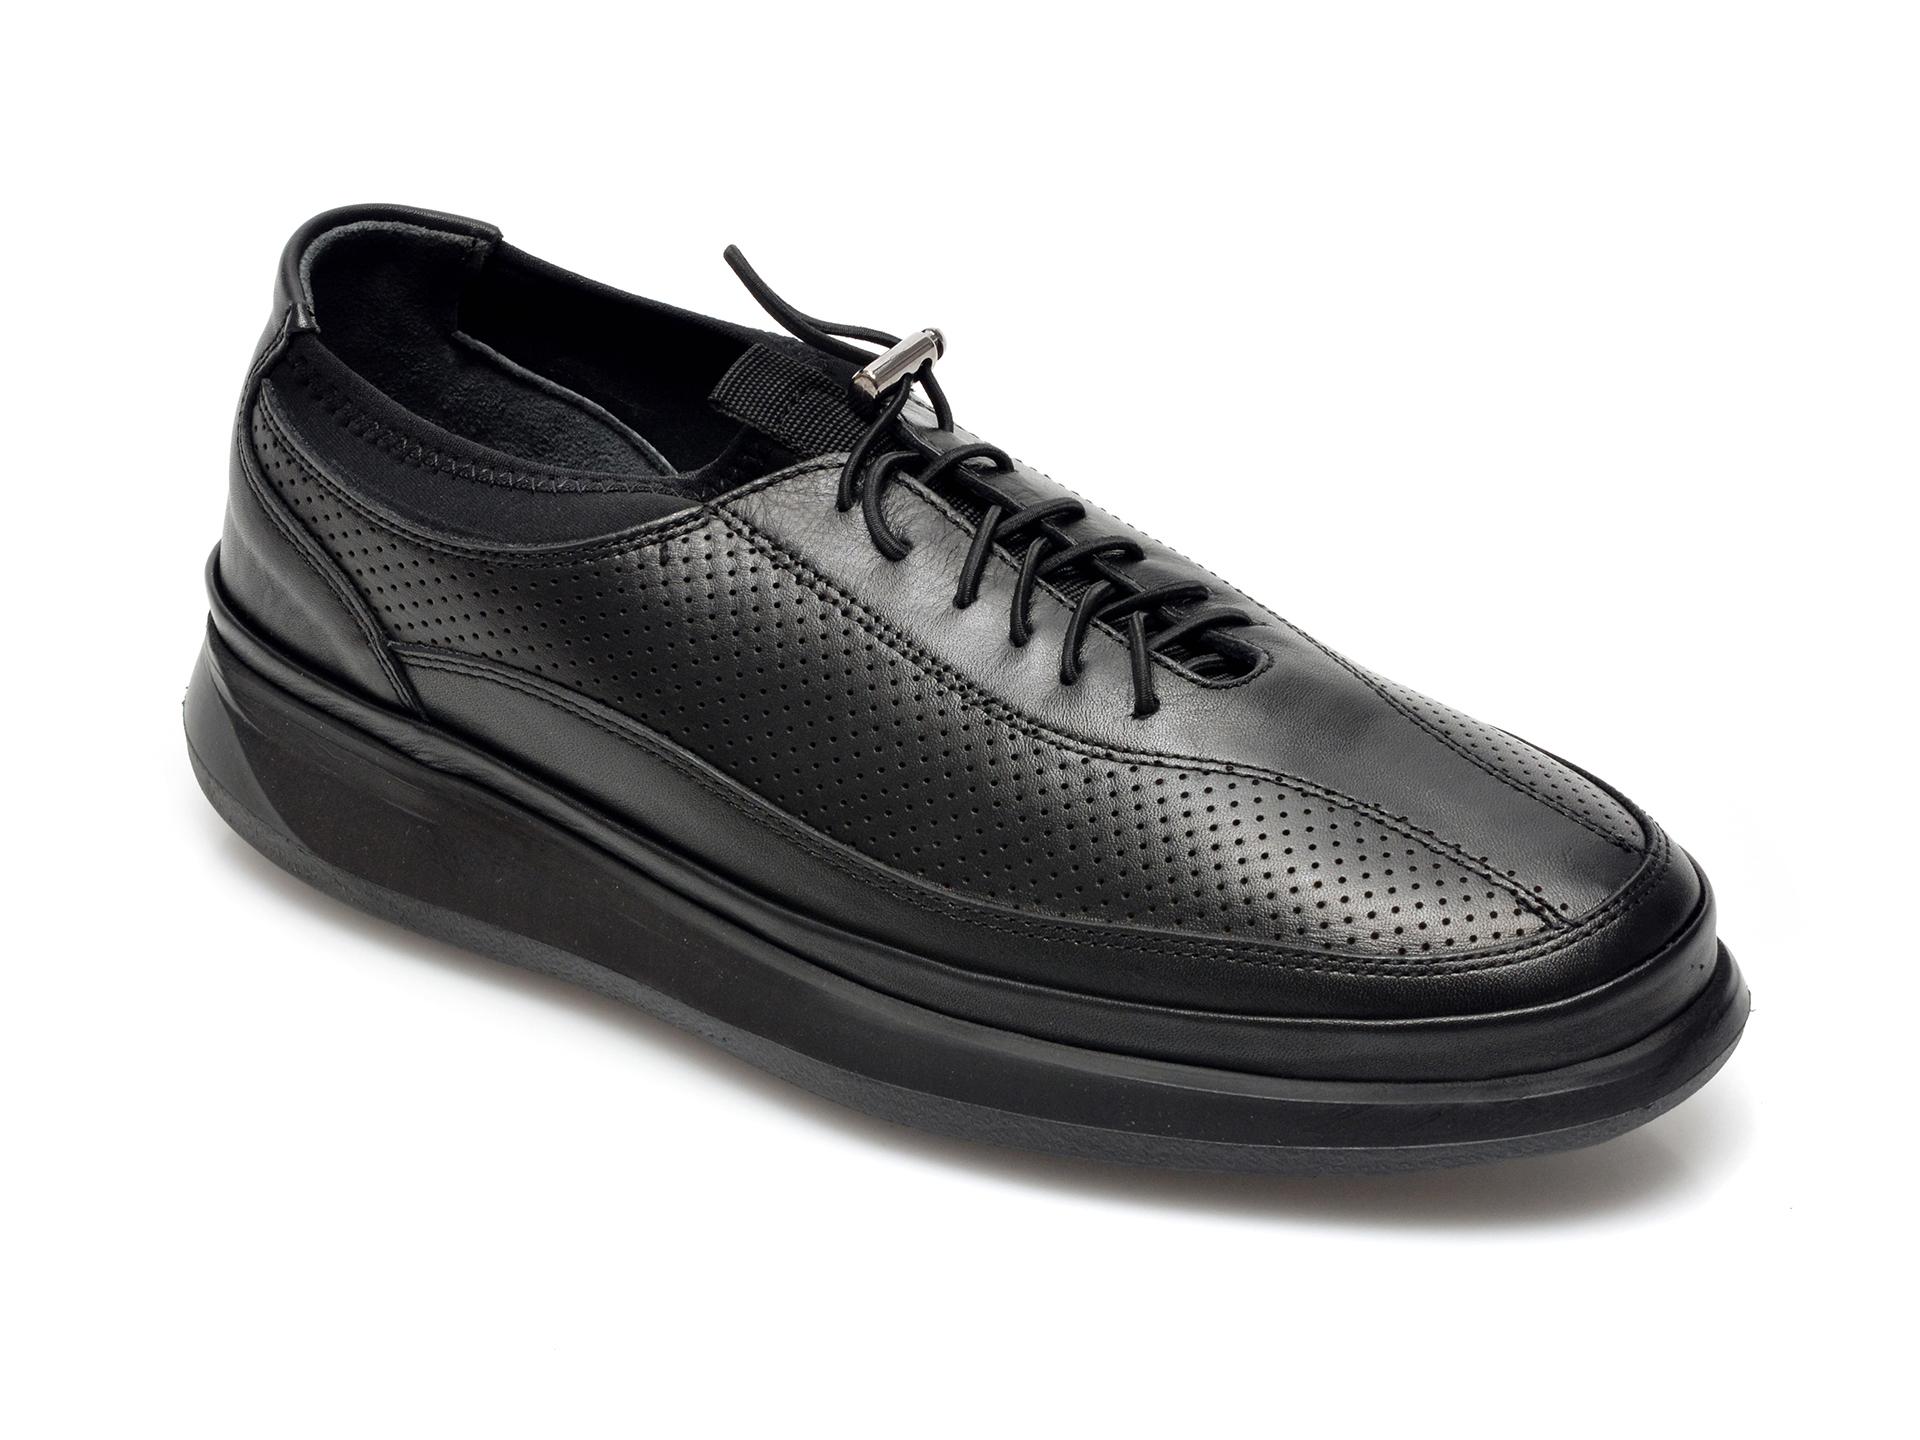 Pantofi OTTER negri, M6065, din piele naturala